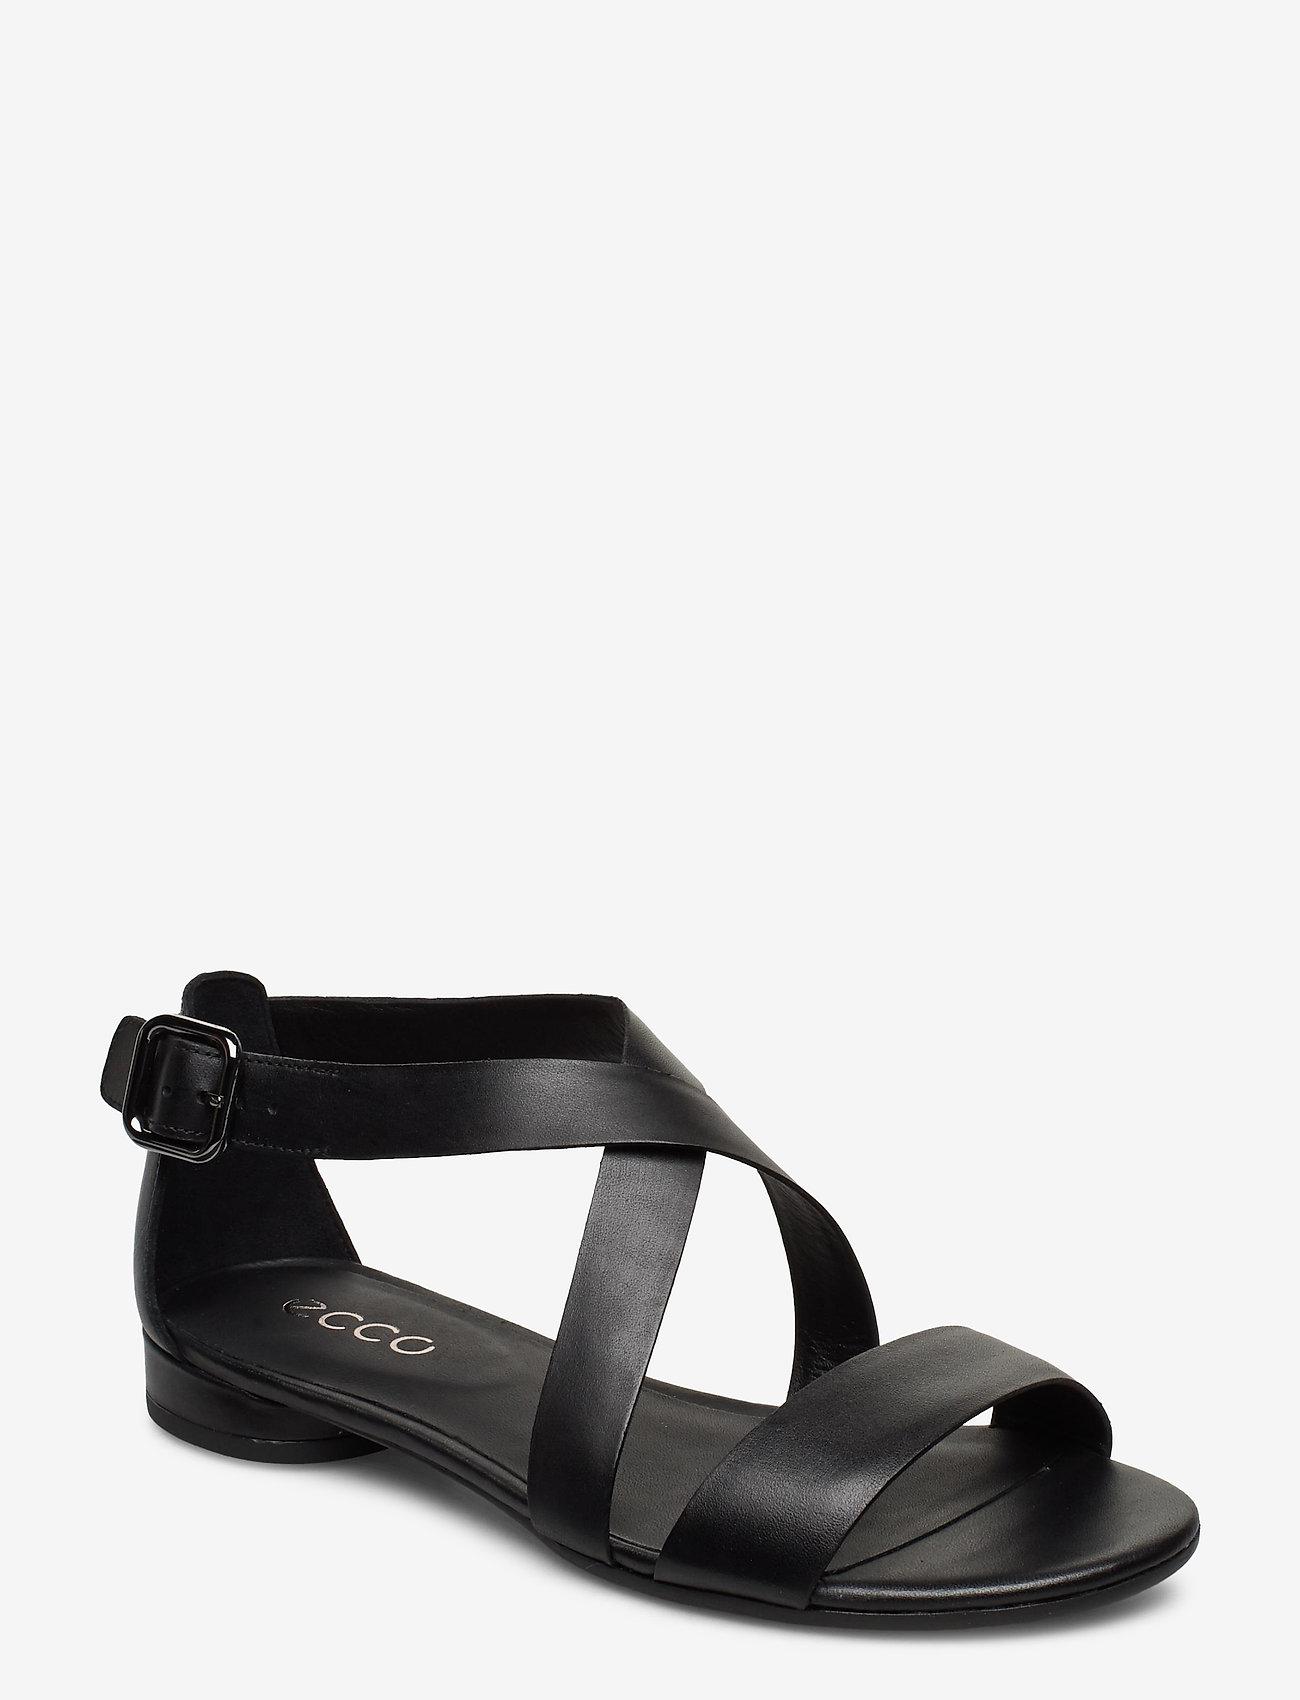 ECCO - W FLAT SANDAL II - flat sandals - black - 0